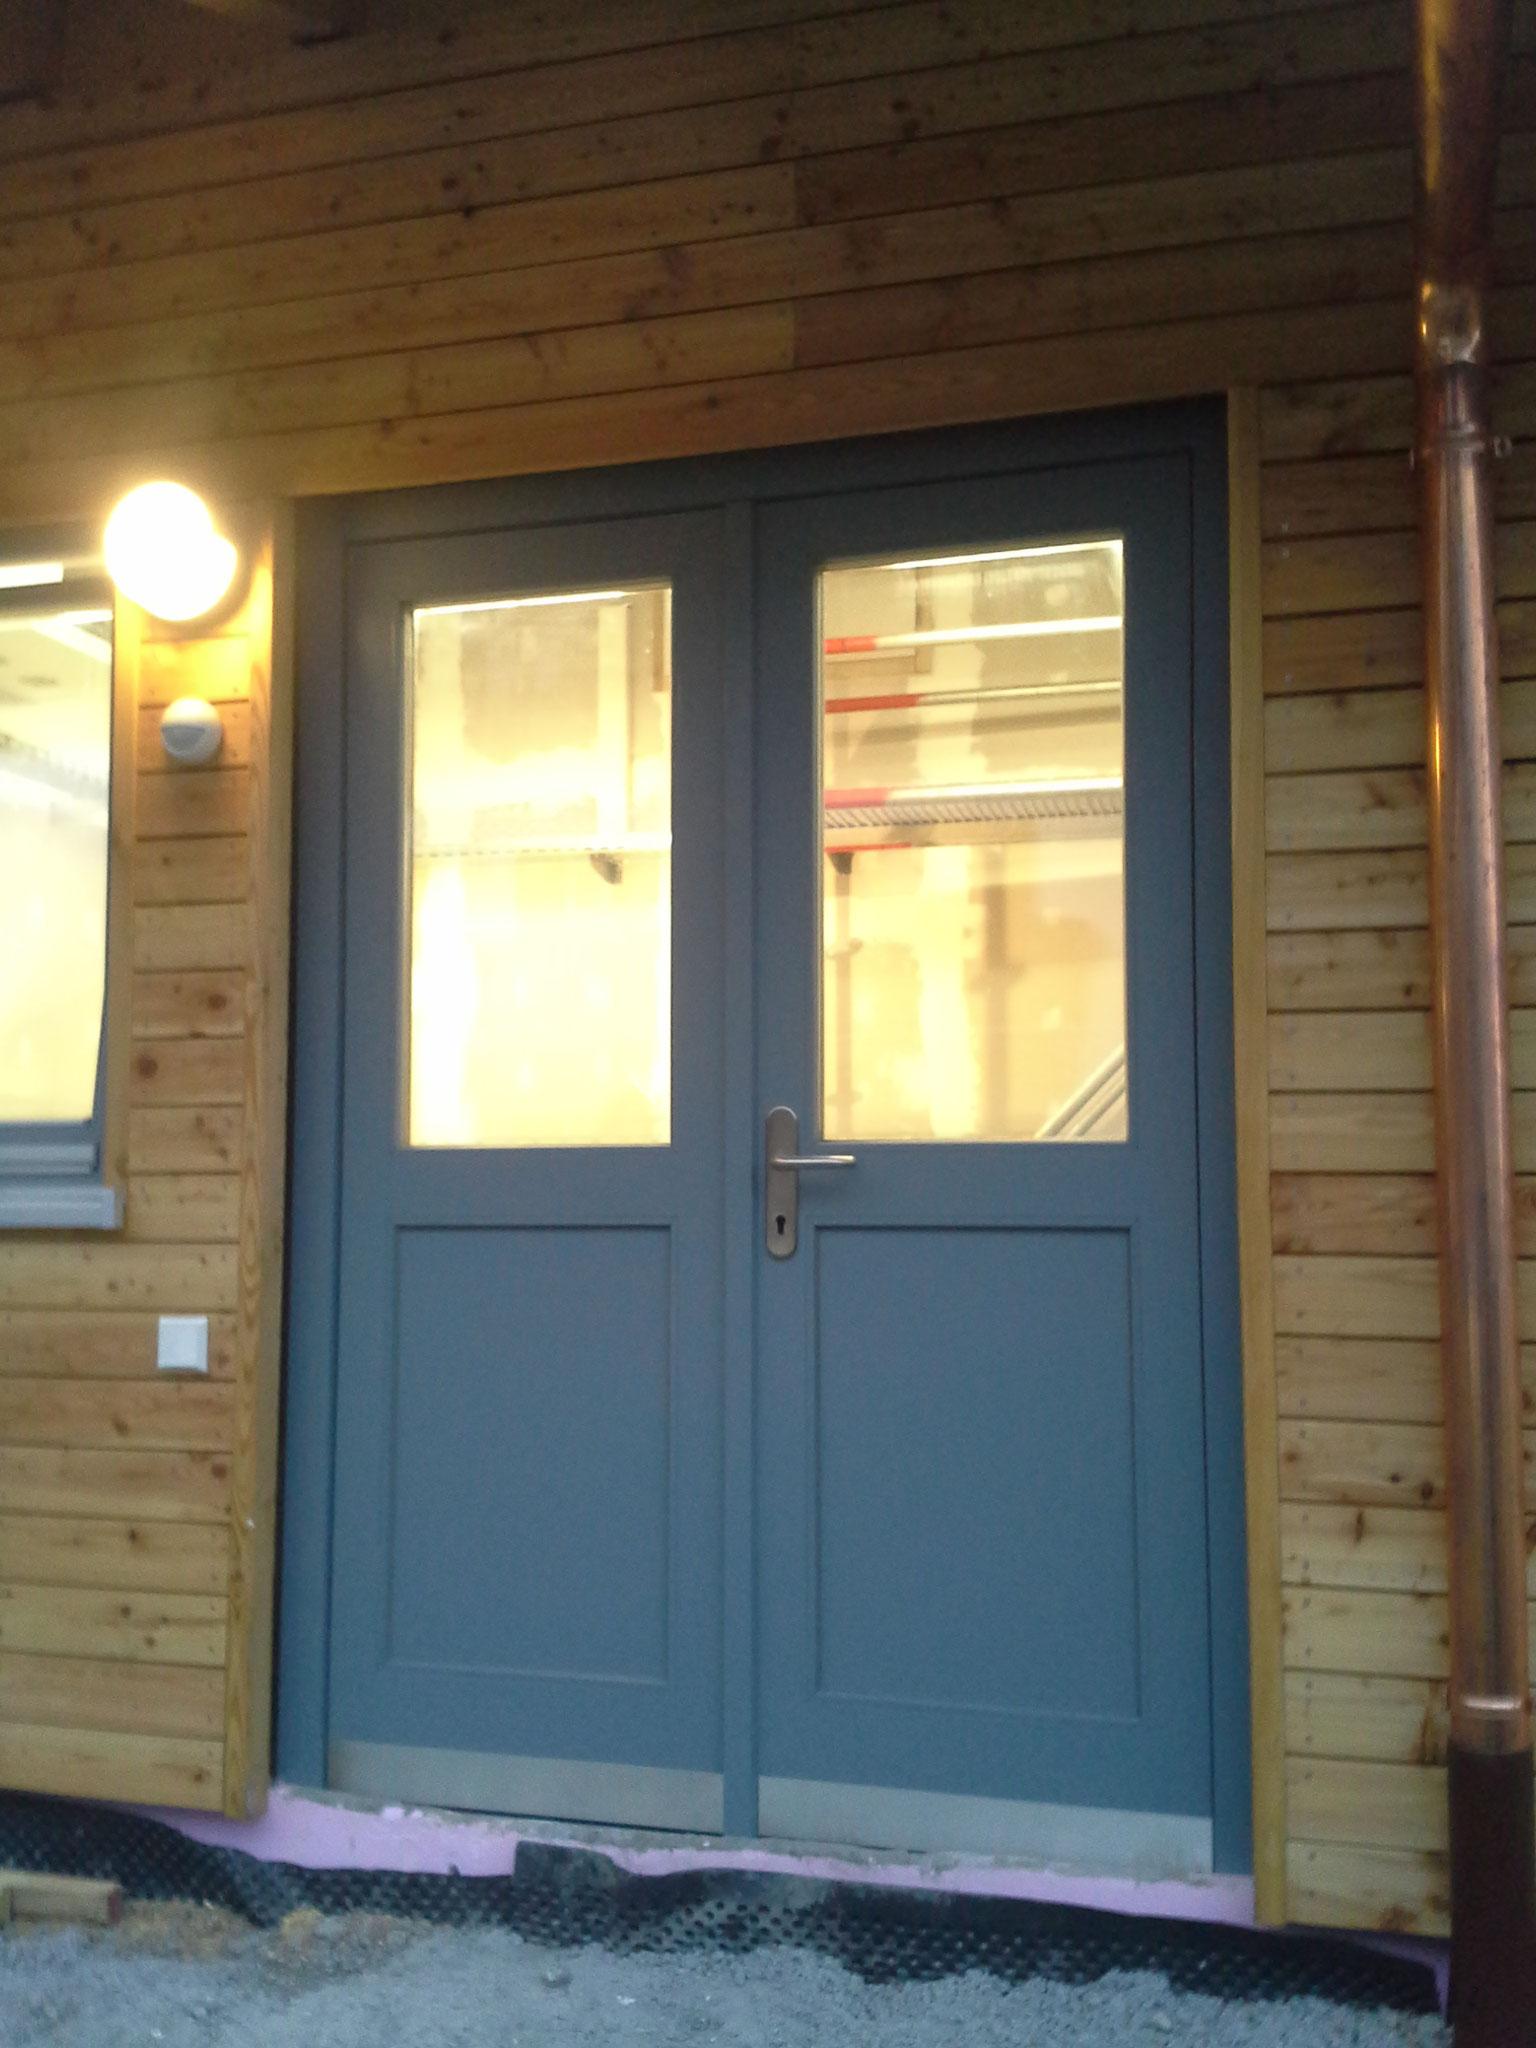 2 - teilige Werkstatt - Türe